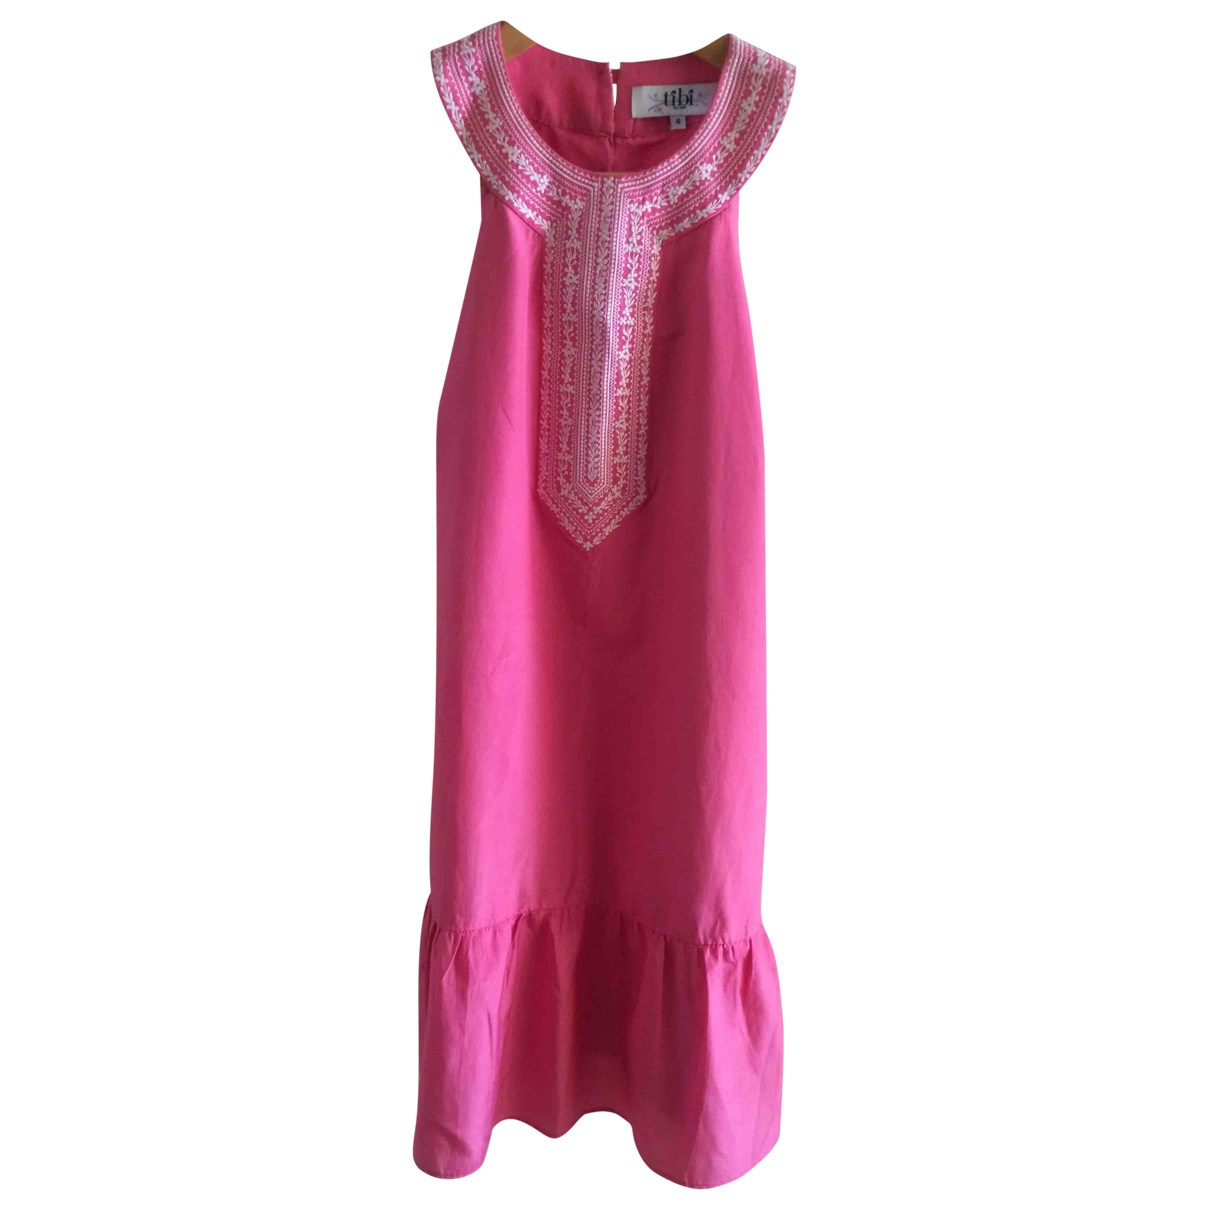 Tibi \N Pink Silk dress for Women 4 US